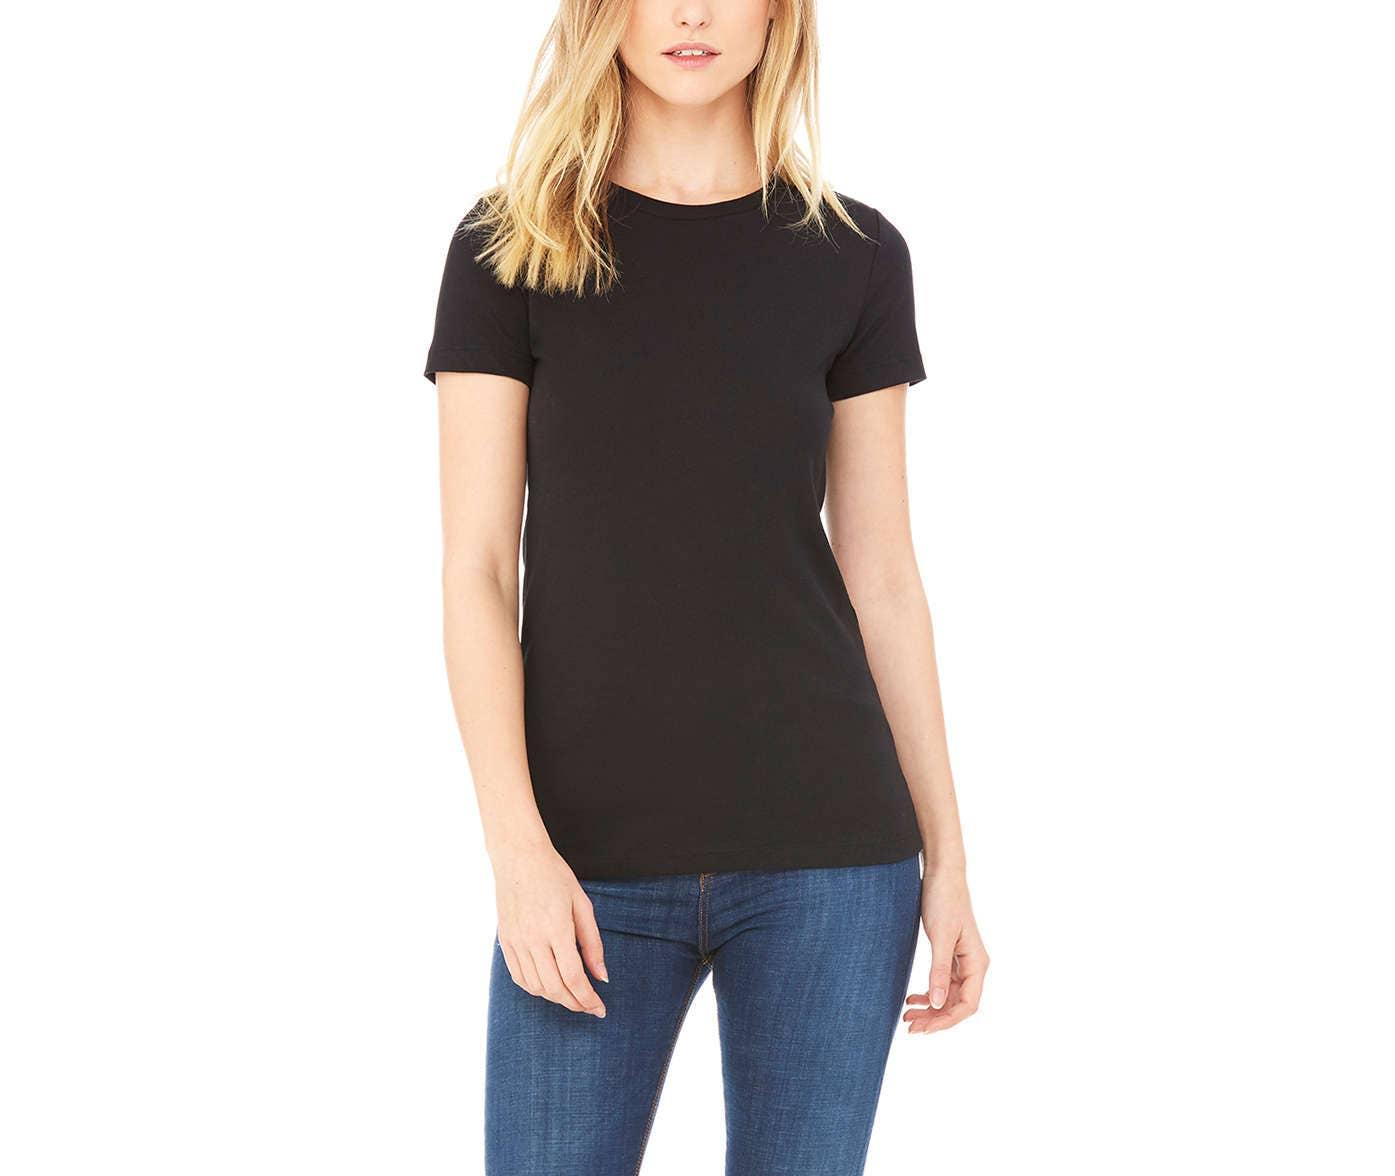 Black Tshirt for Women High Crewneck Plain T Shirt Womens ...